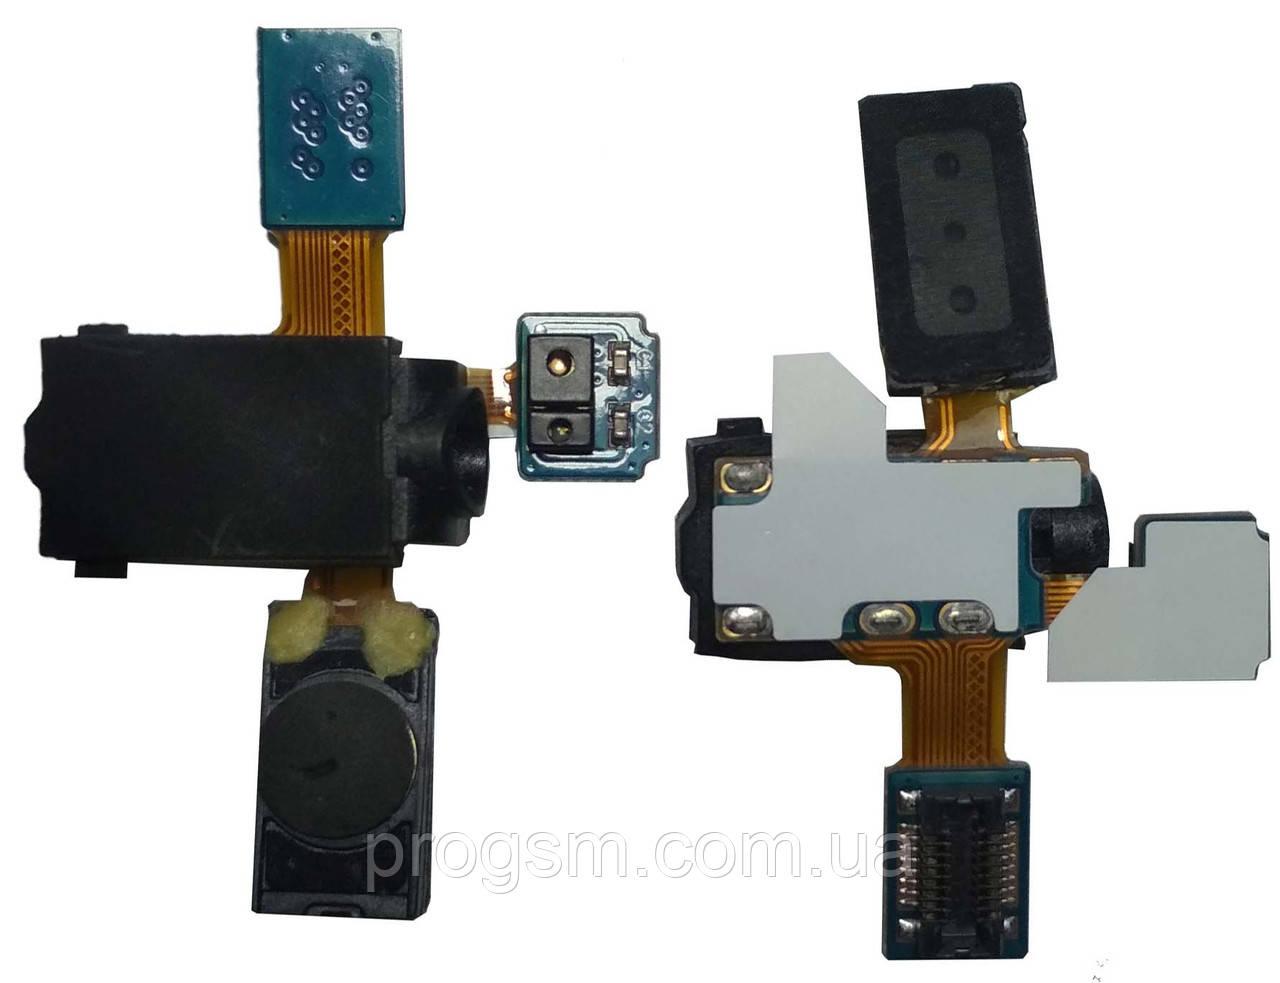 Шлейф Samsung Galaxy Pro B7510 Speaker headset Original